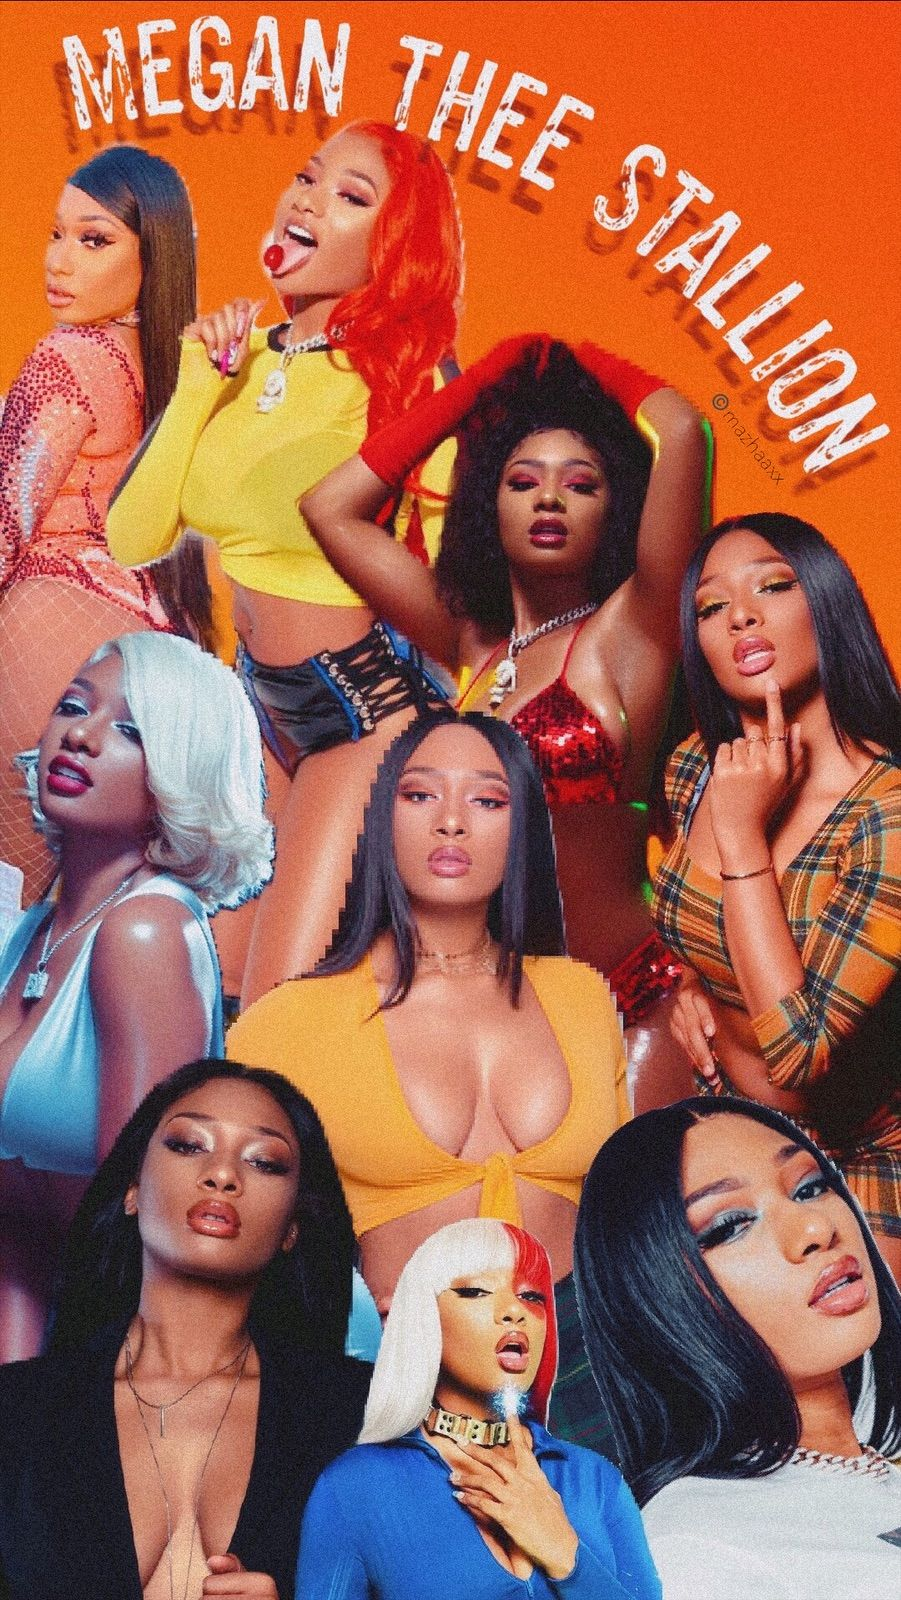 Thee Stallion Collage In 2020 Iconic Wallpaper Bad Girl Aesthetic Black Girl Aesthetic